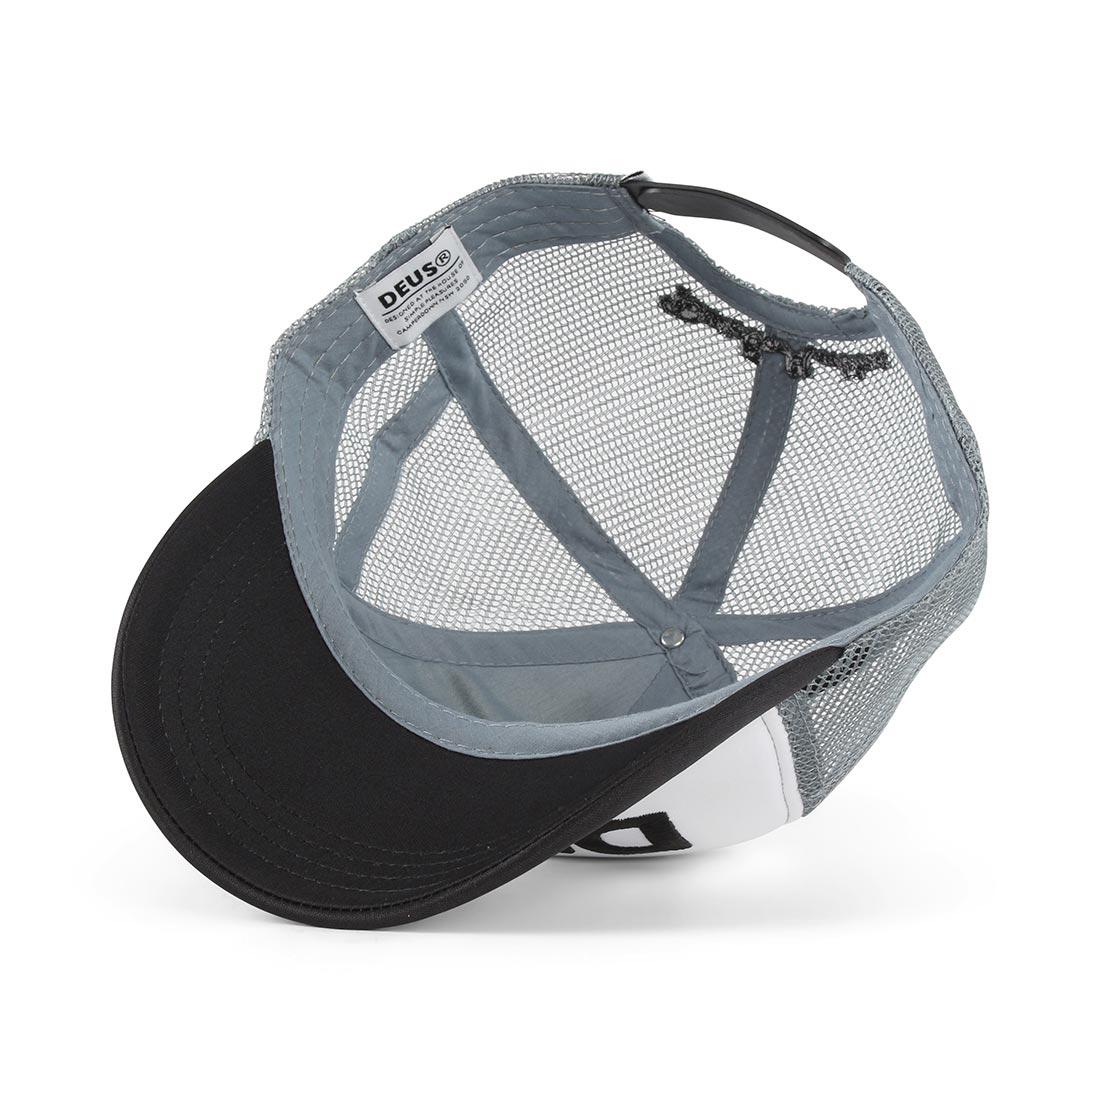 Deus Ex Machina Caps Trucker Cap - Black / Grey